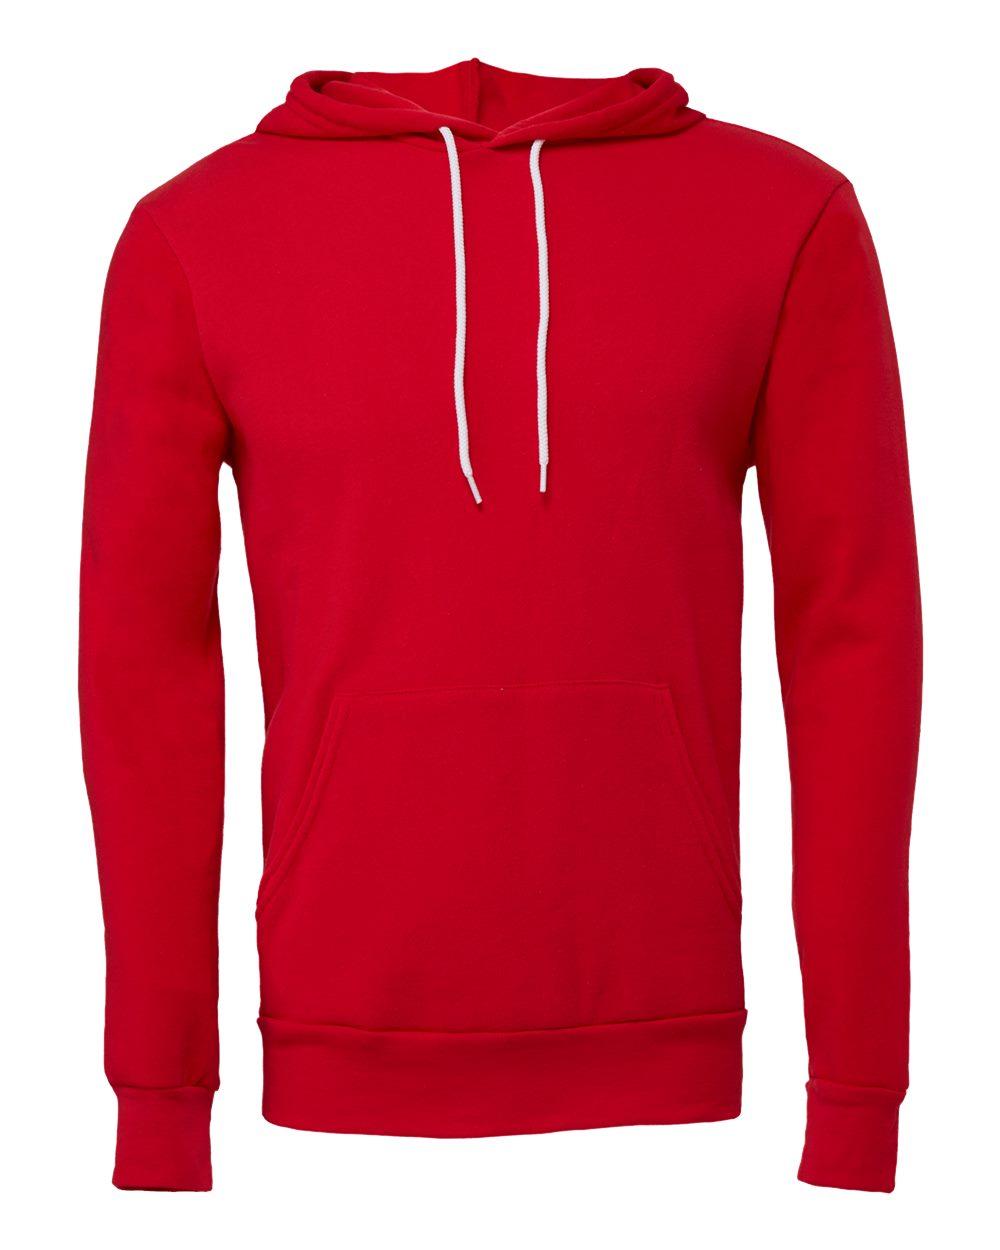 Bella-Canvas-Unisex-Sponge-Hooded-Pullover-Sweatshirt-Blank-3719-up-to-2XL thumbnail 85